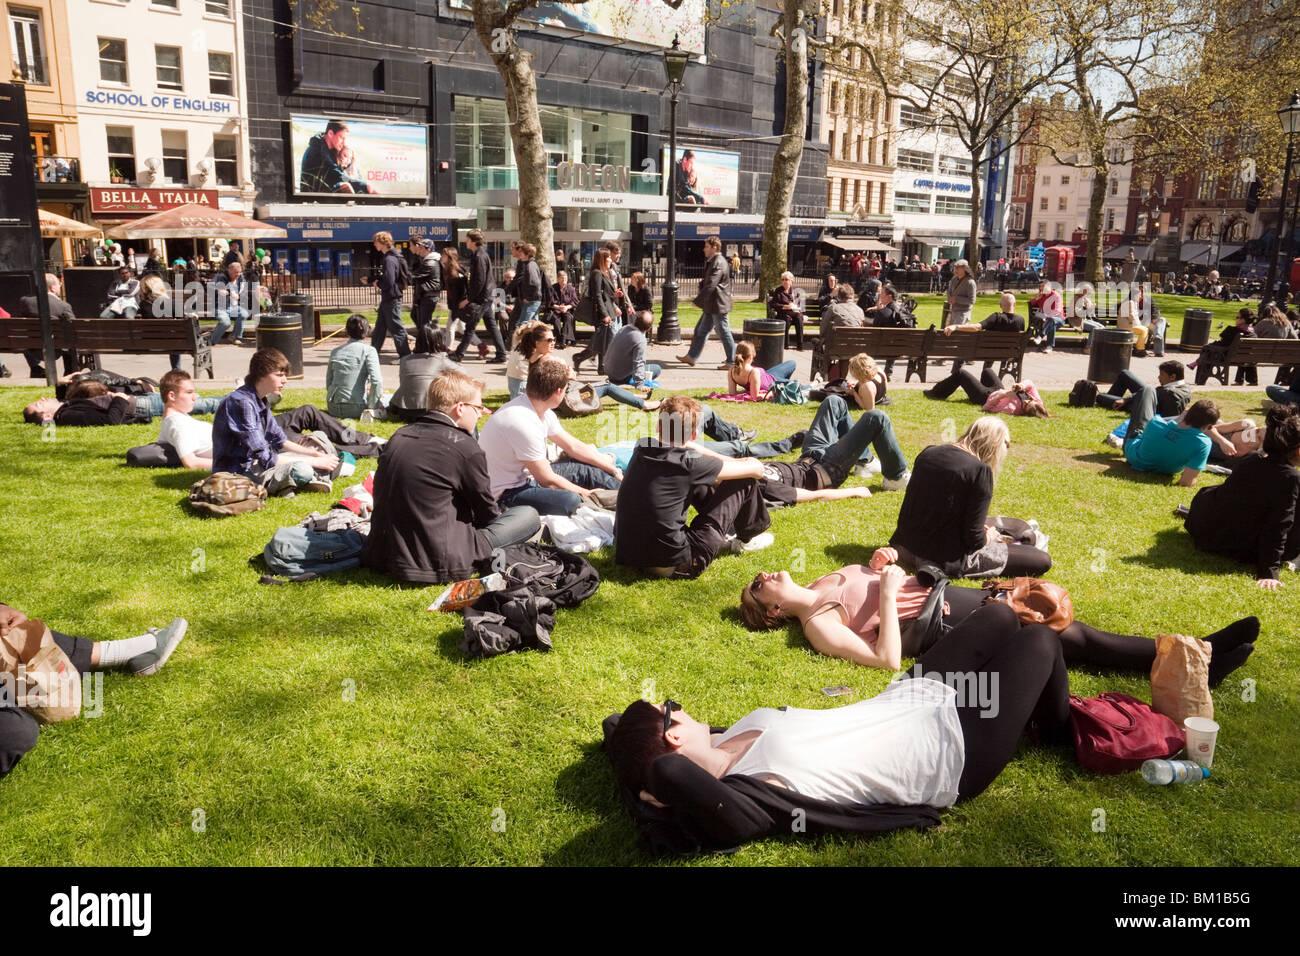 Teenagers sitting on the grass enjoying the sunshine, Leicester Square, London UK - Stock Image